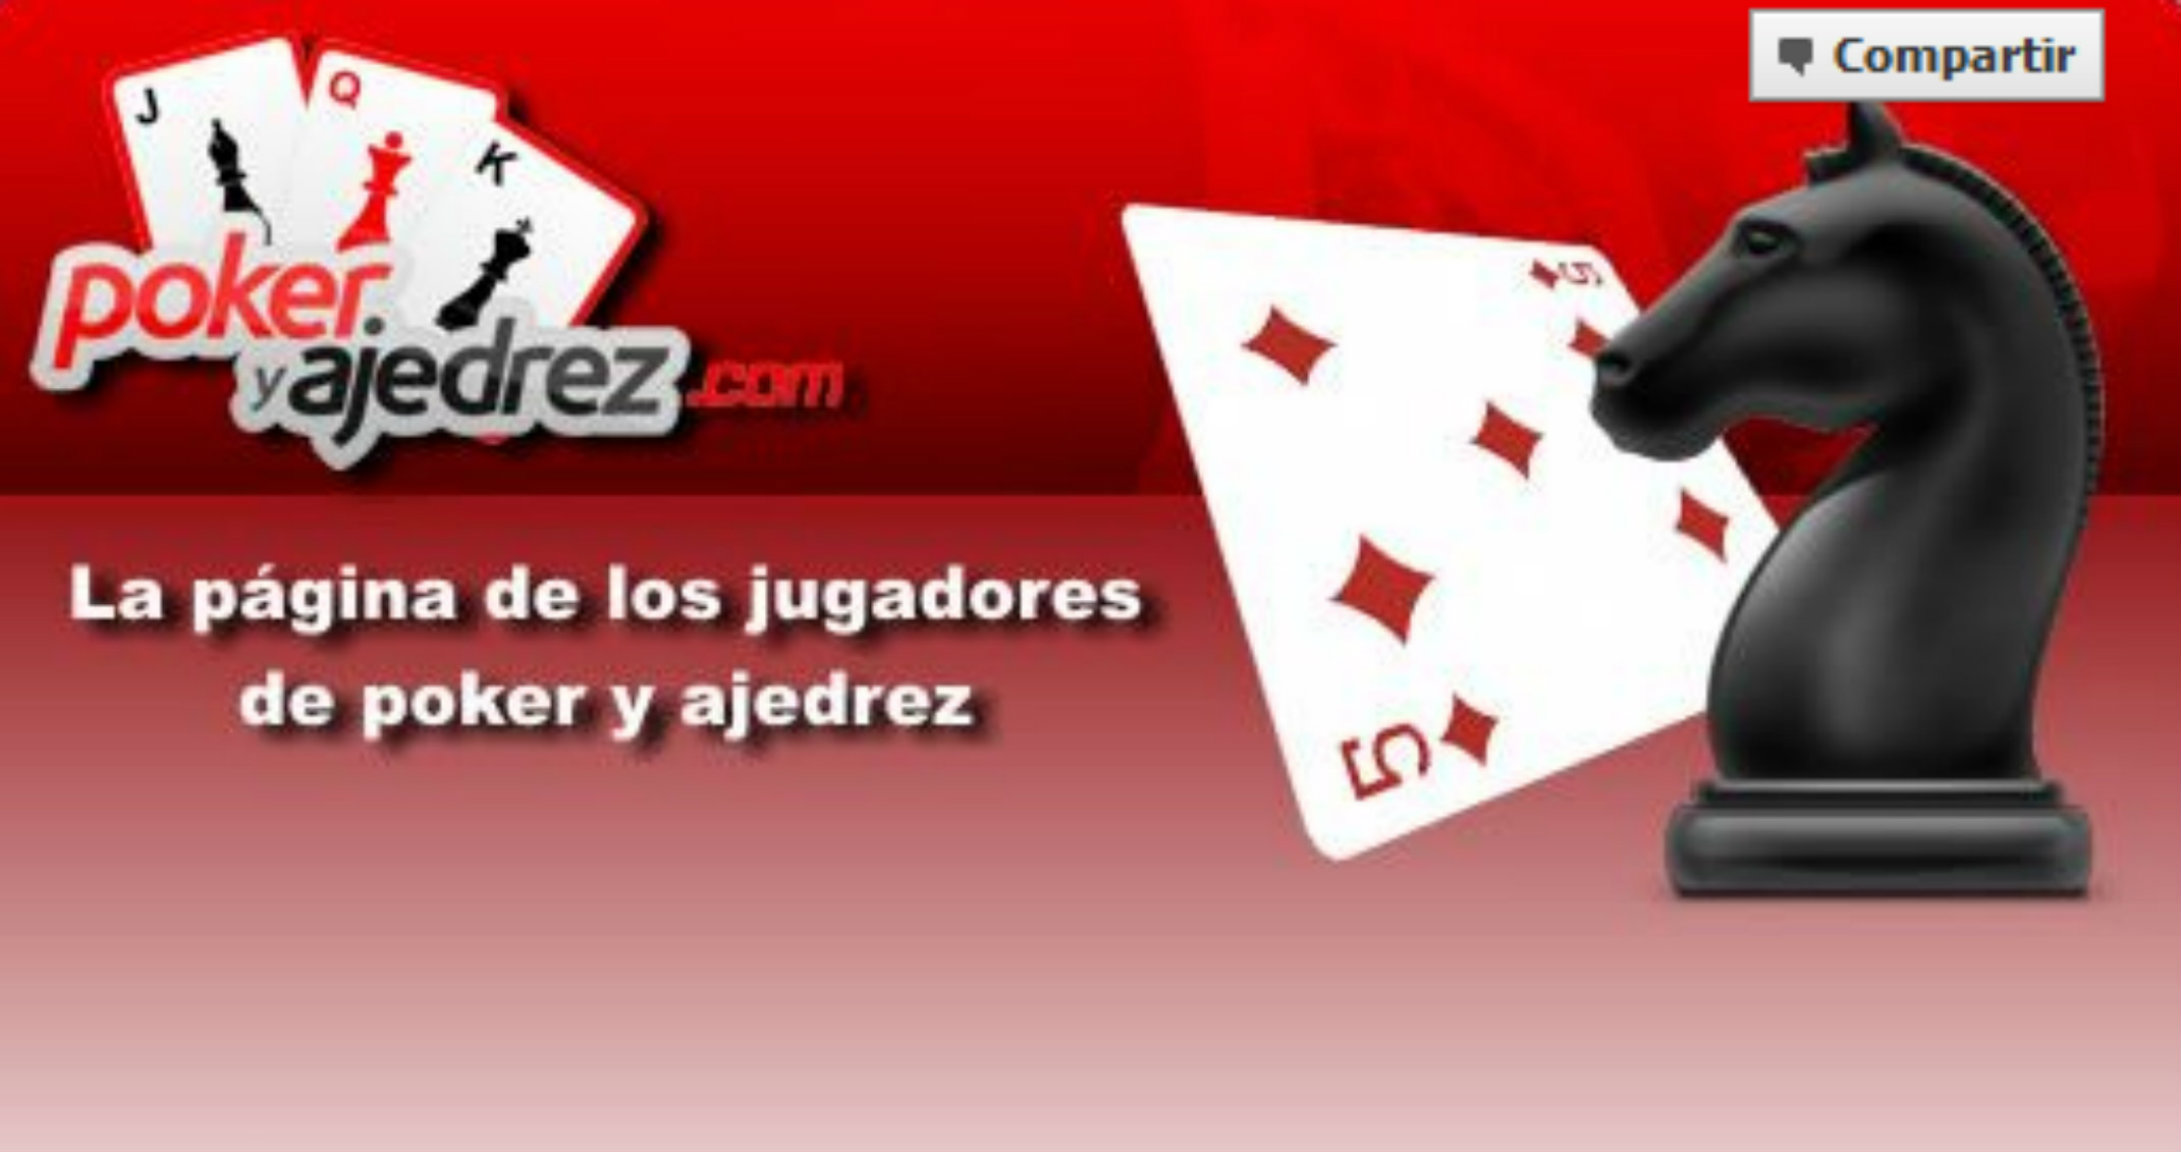 Pokeryajedrez